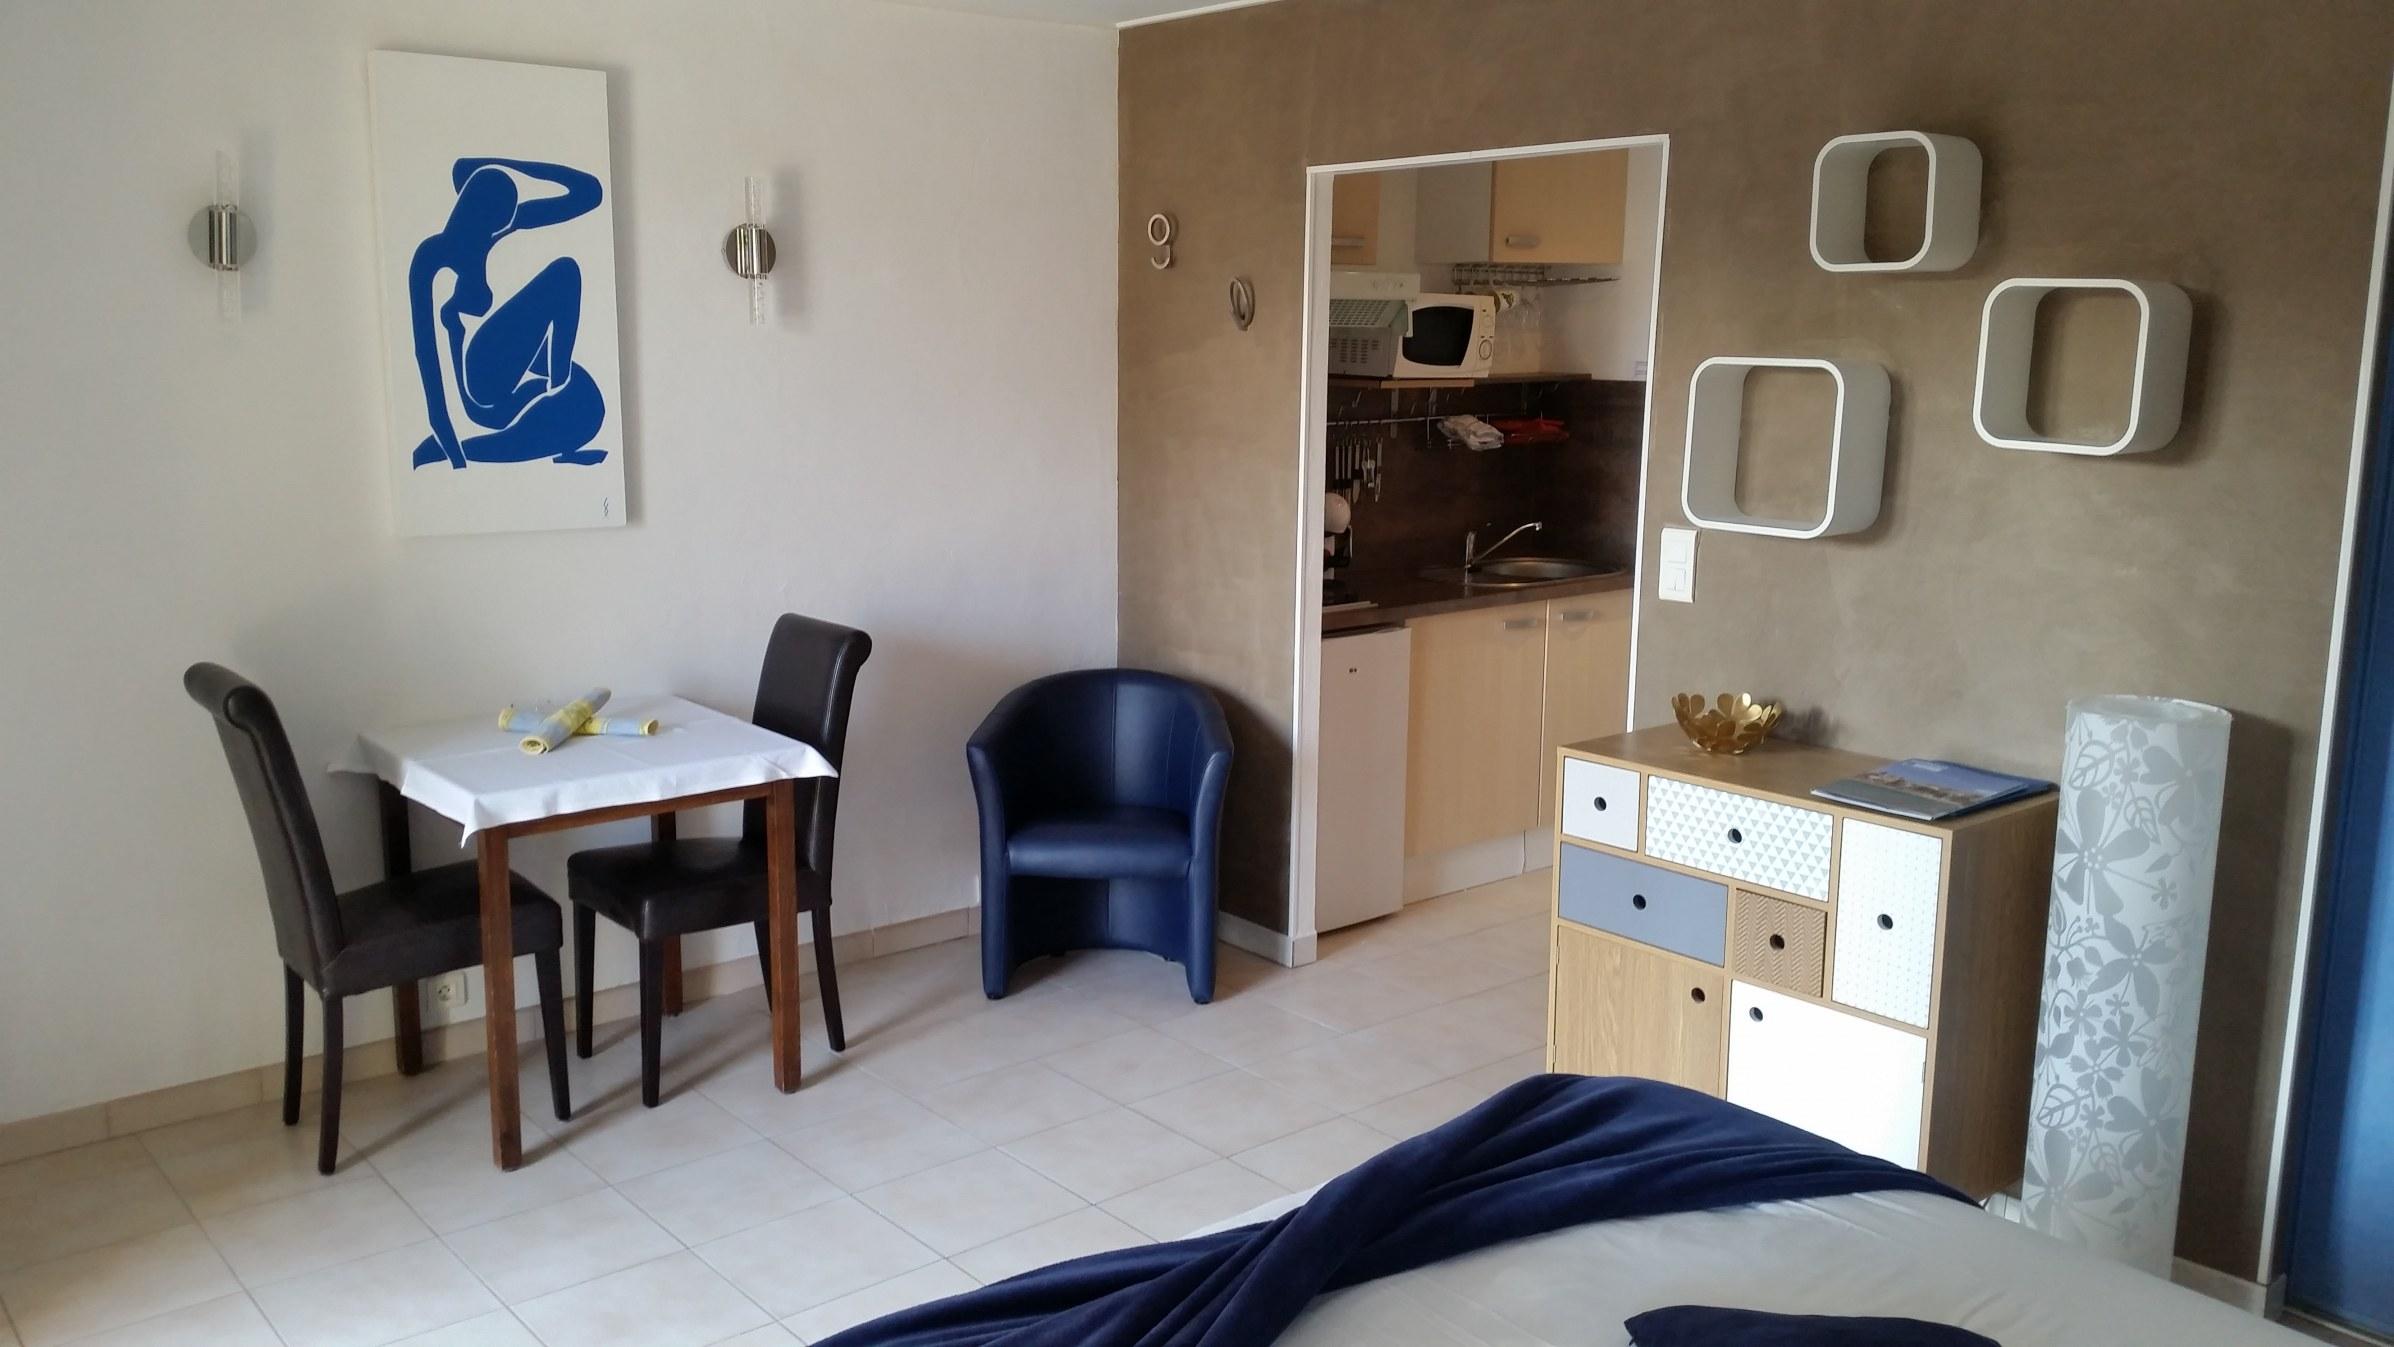 Room Matisse_guest_house_St-Raphael_fréjus_var